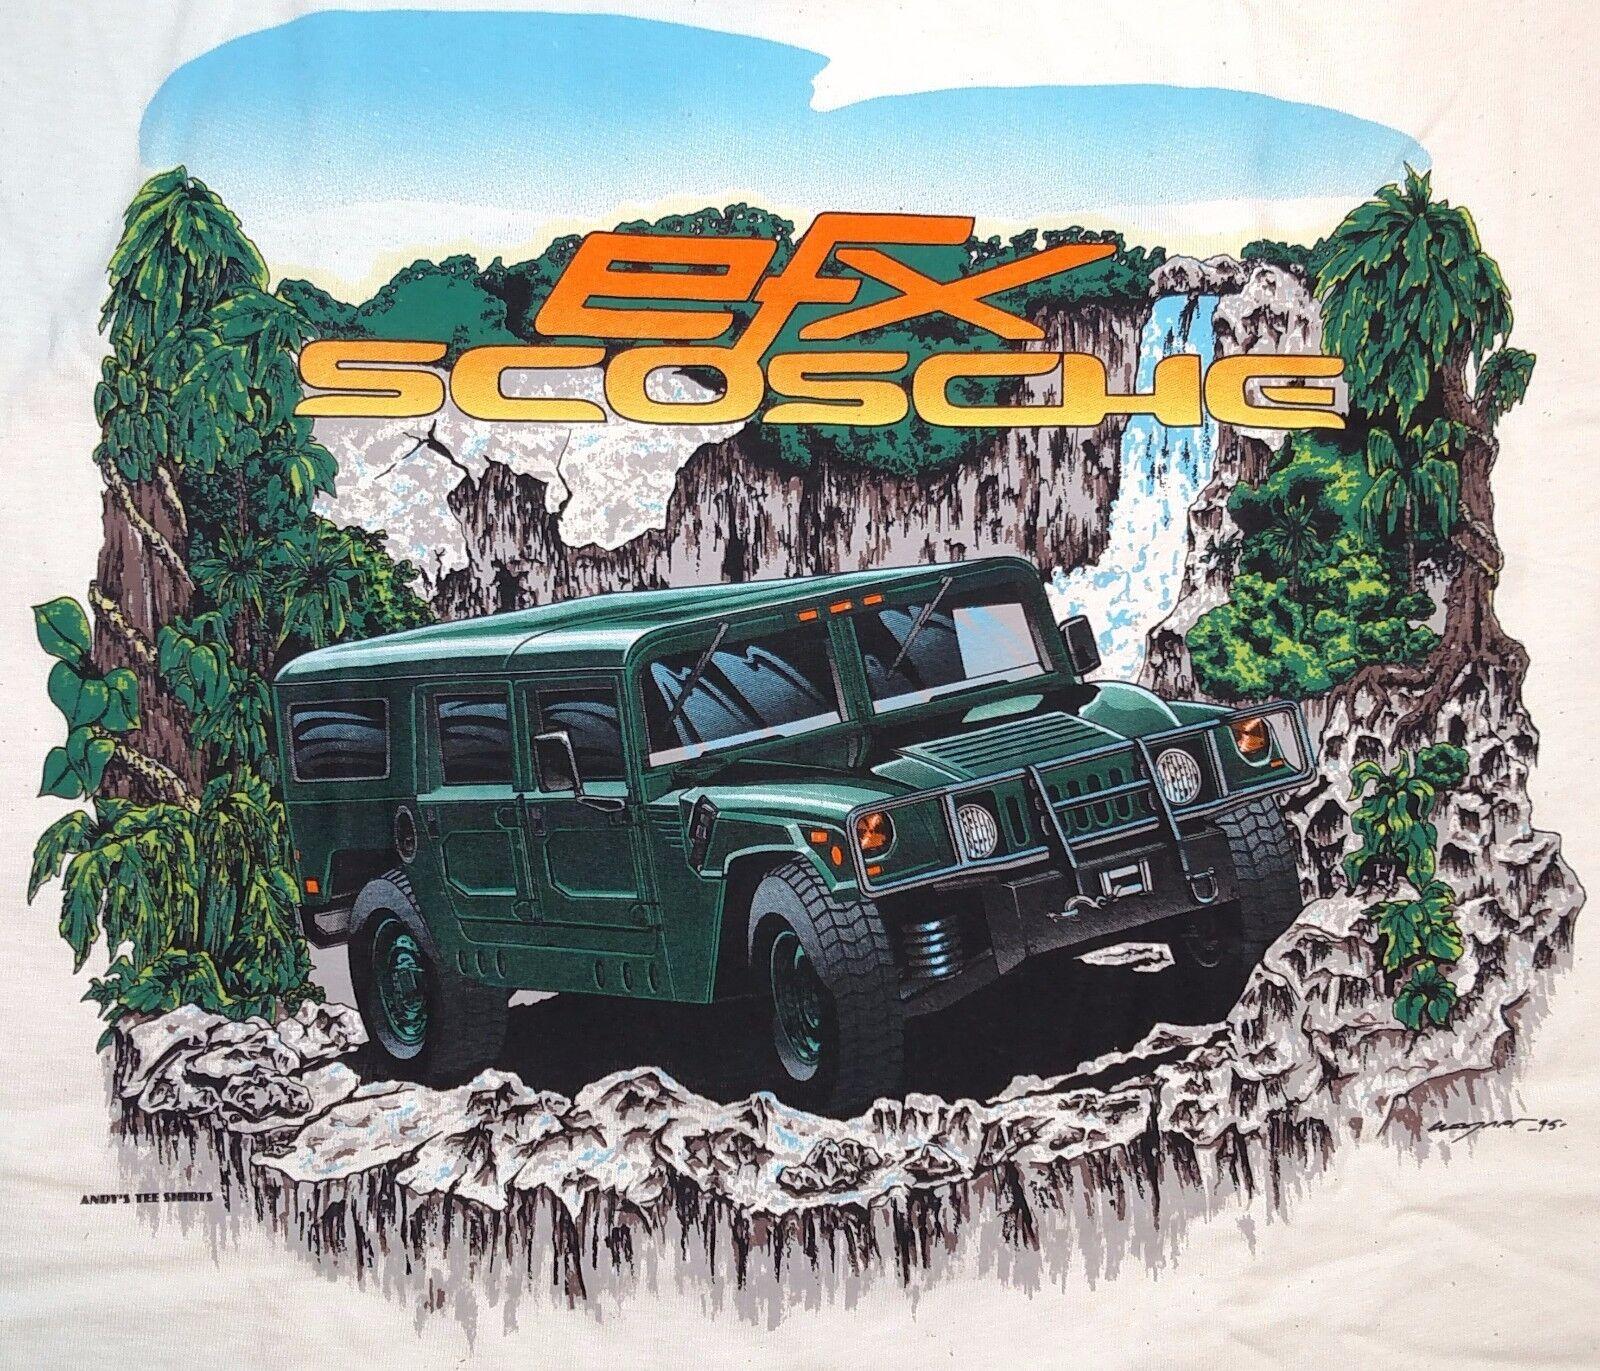 VTG 1995 Andy's Tee Shirts EFX Scosche Car Audio Hummer H1 T-Shirt XXL NWOT